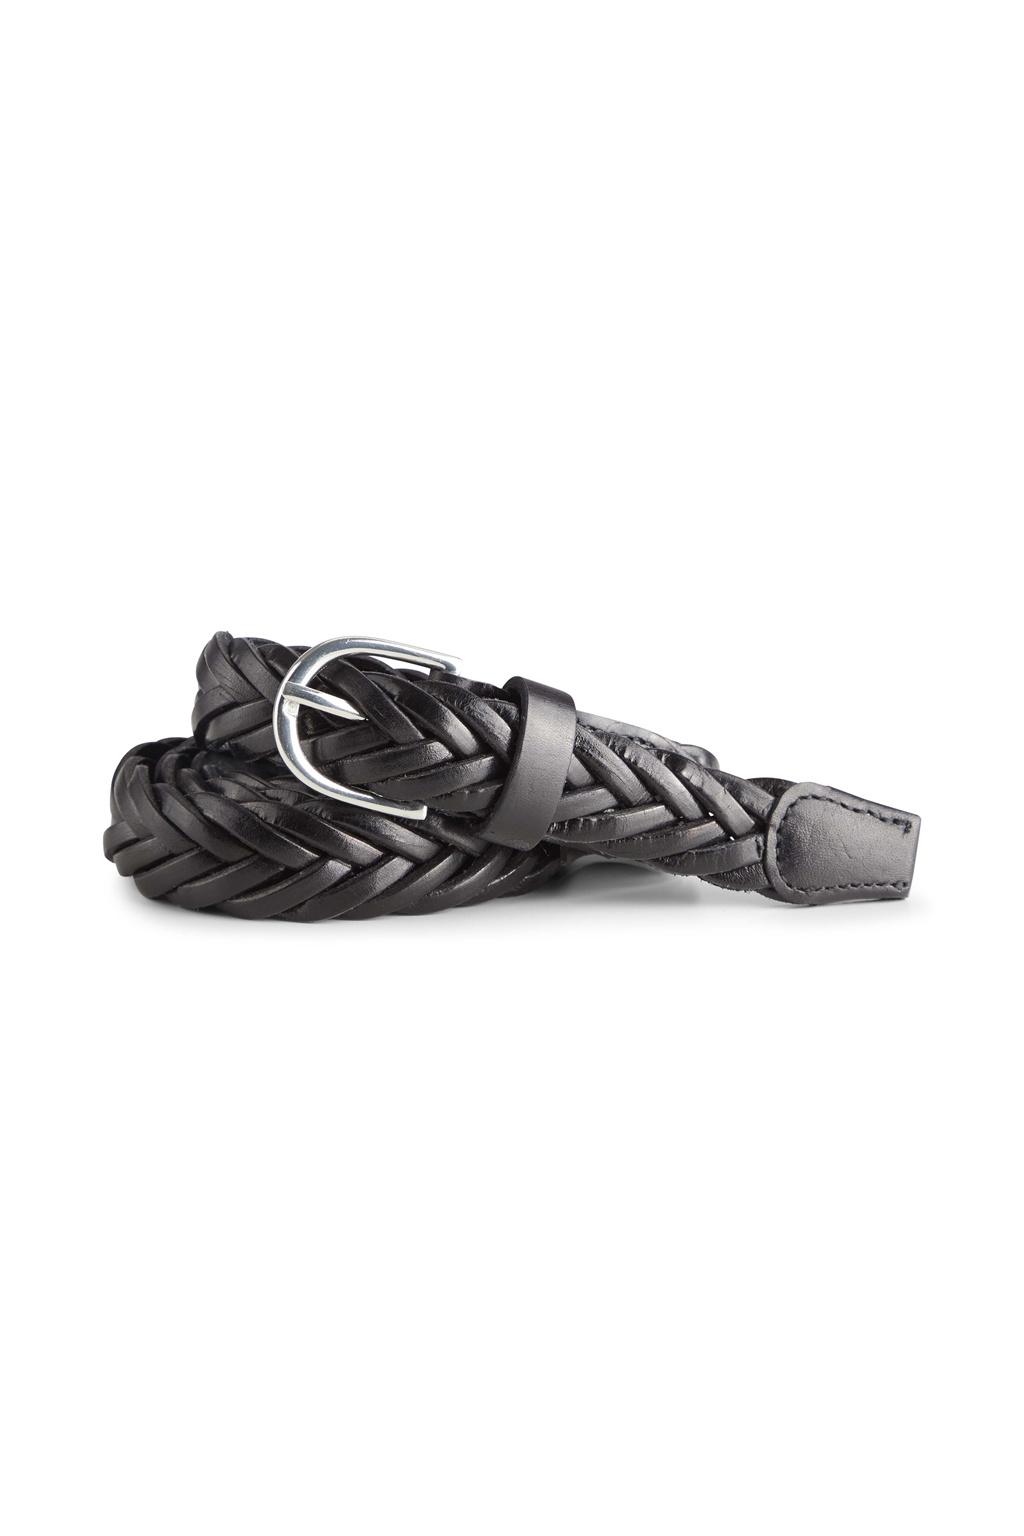 Nerea Leather Belt - Black-1